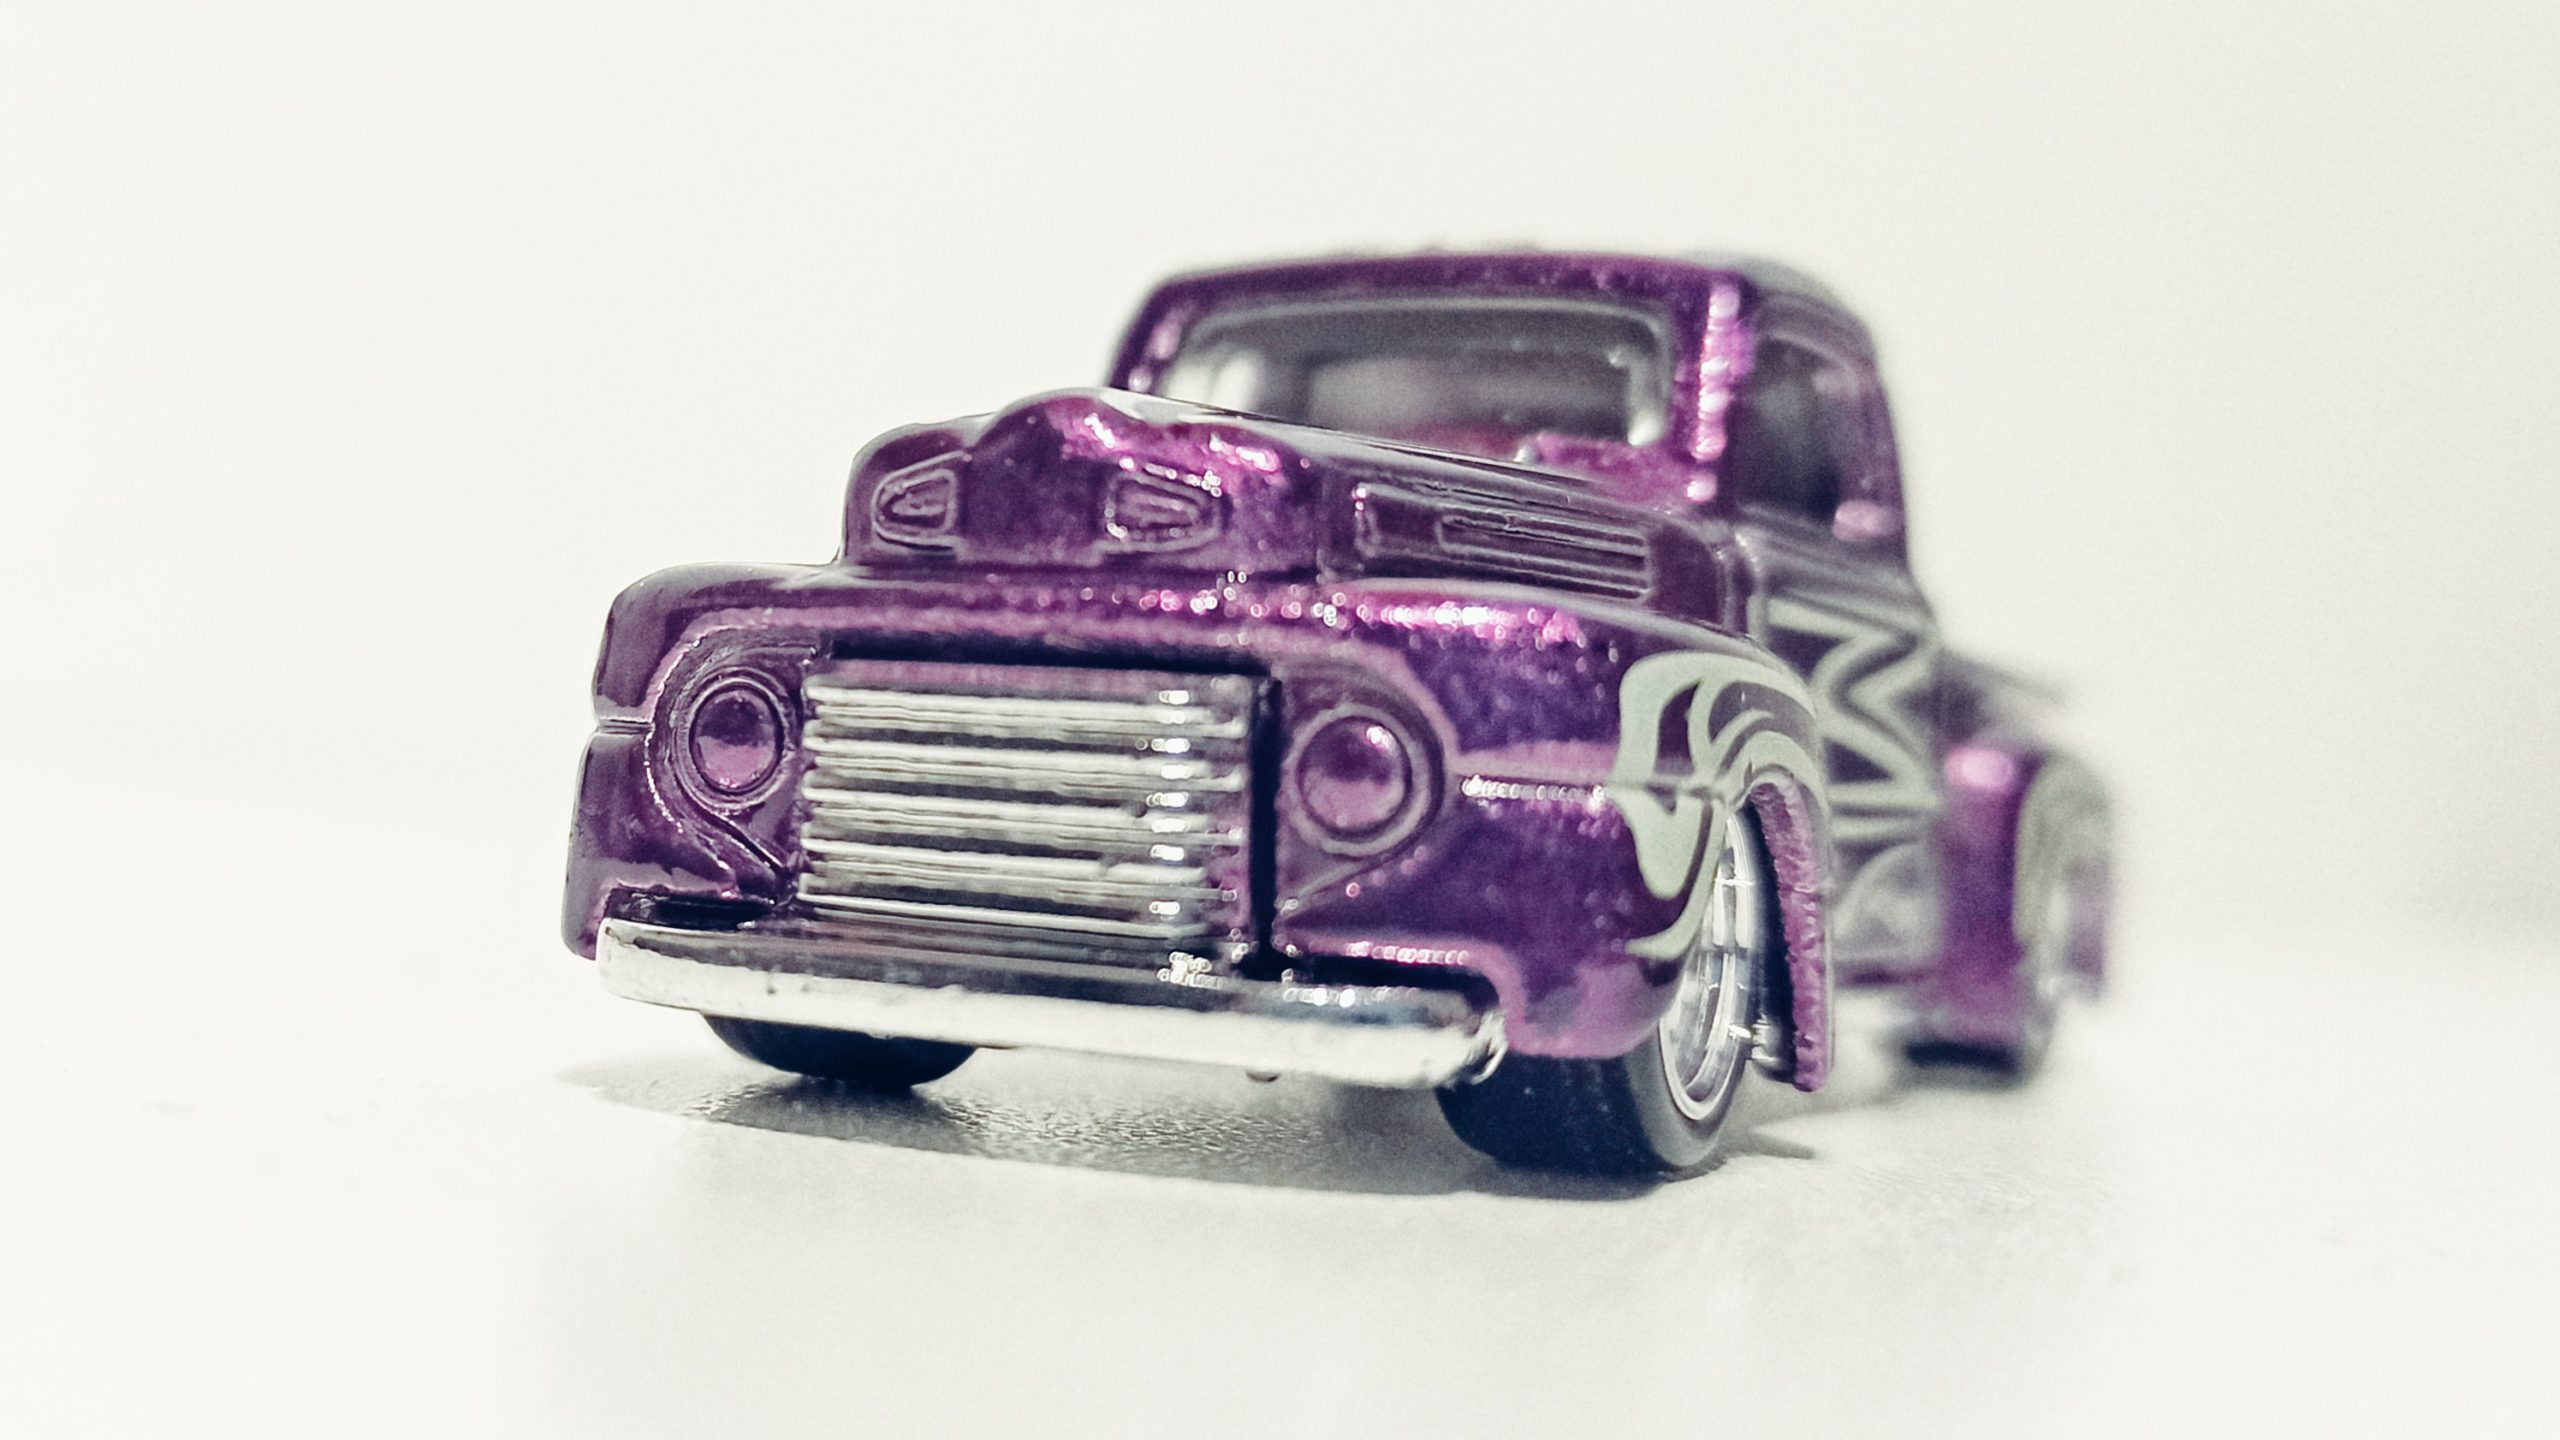 Hot Wheels '49 Ford F1 (GTD03) 2021 (225/250) HW Hot Trucks (6/10) spectraflame purple Super Treasure Hunt (STH) front angle